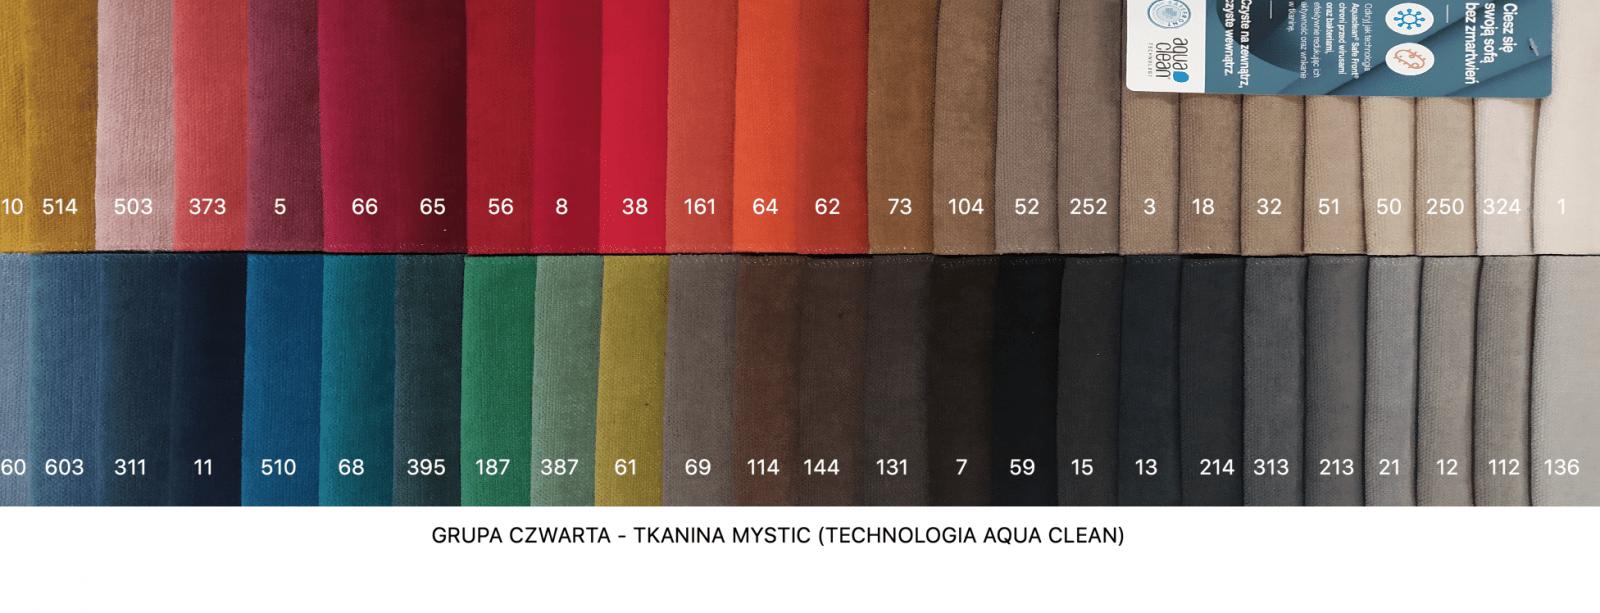 Sofa Tivoli Befame - wzorniki tkanin